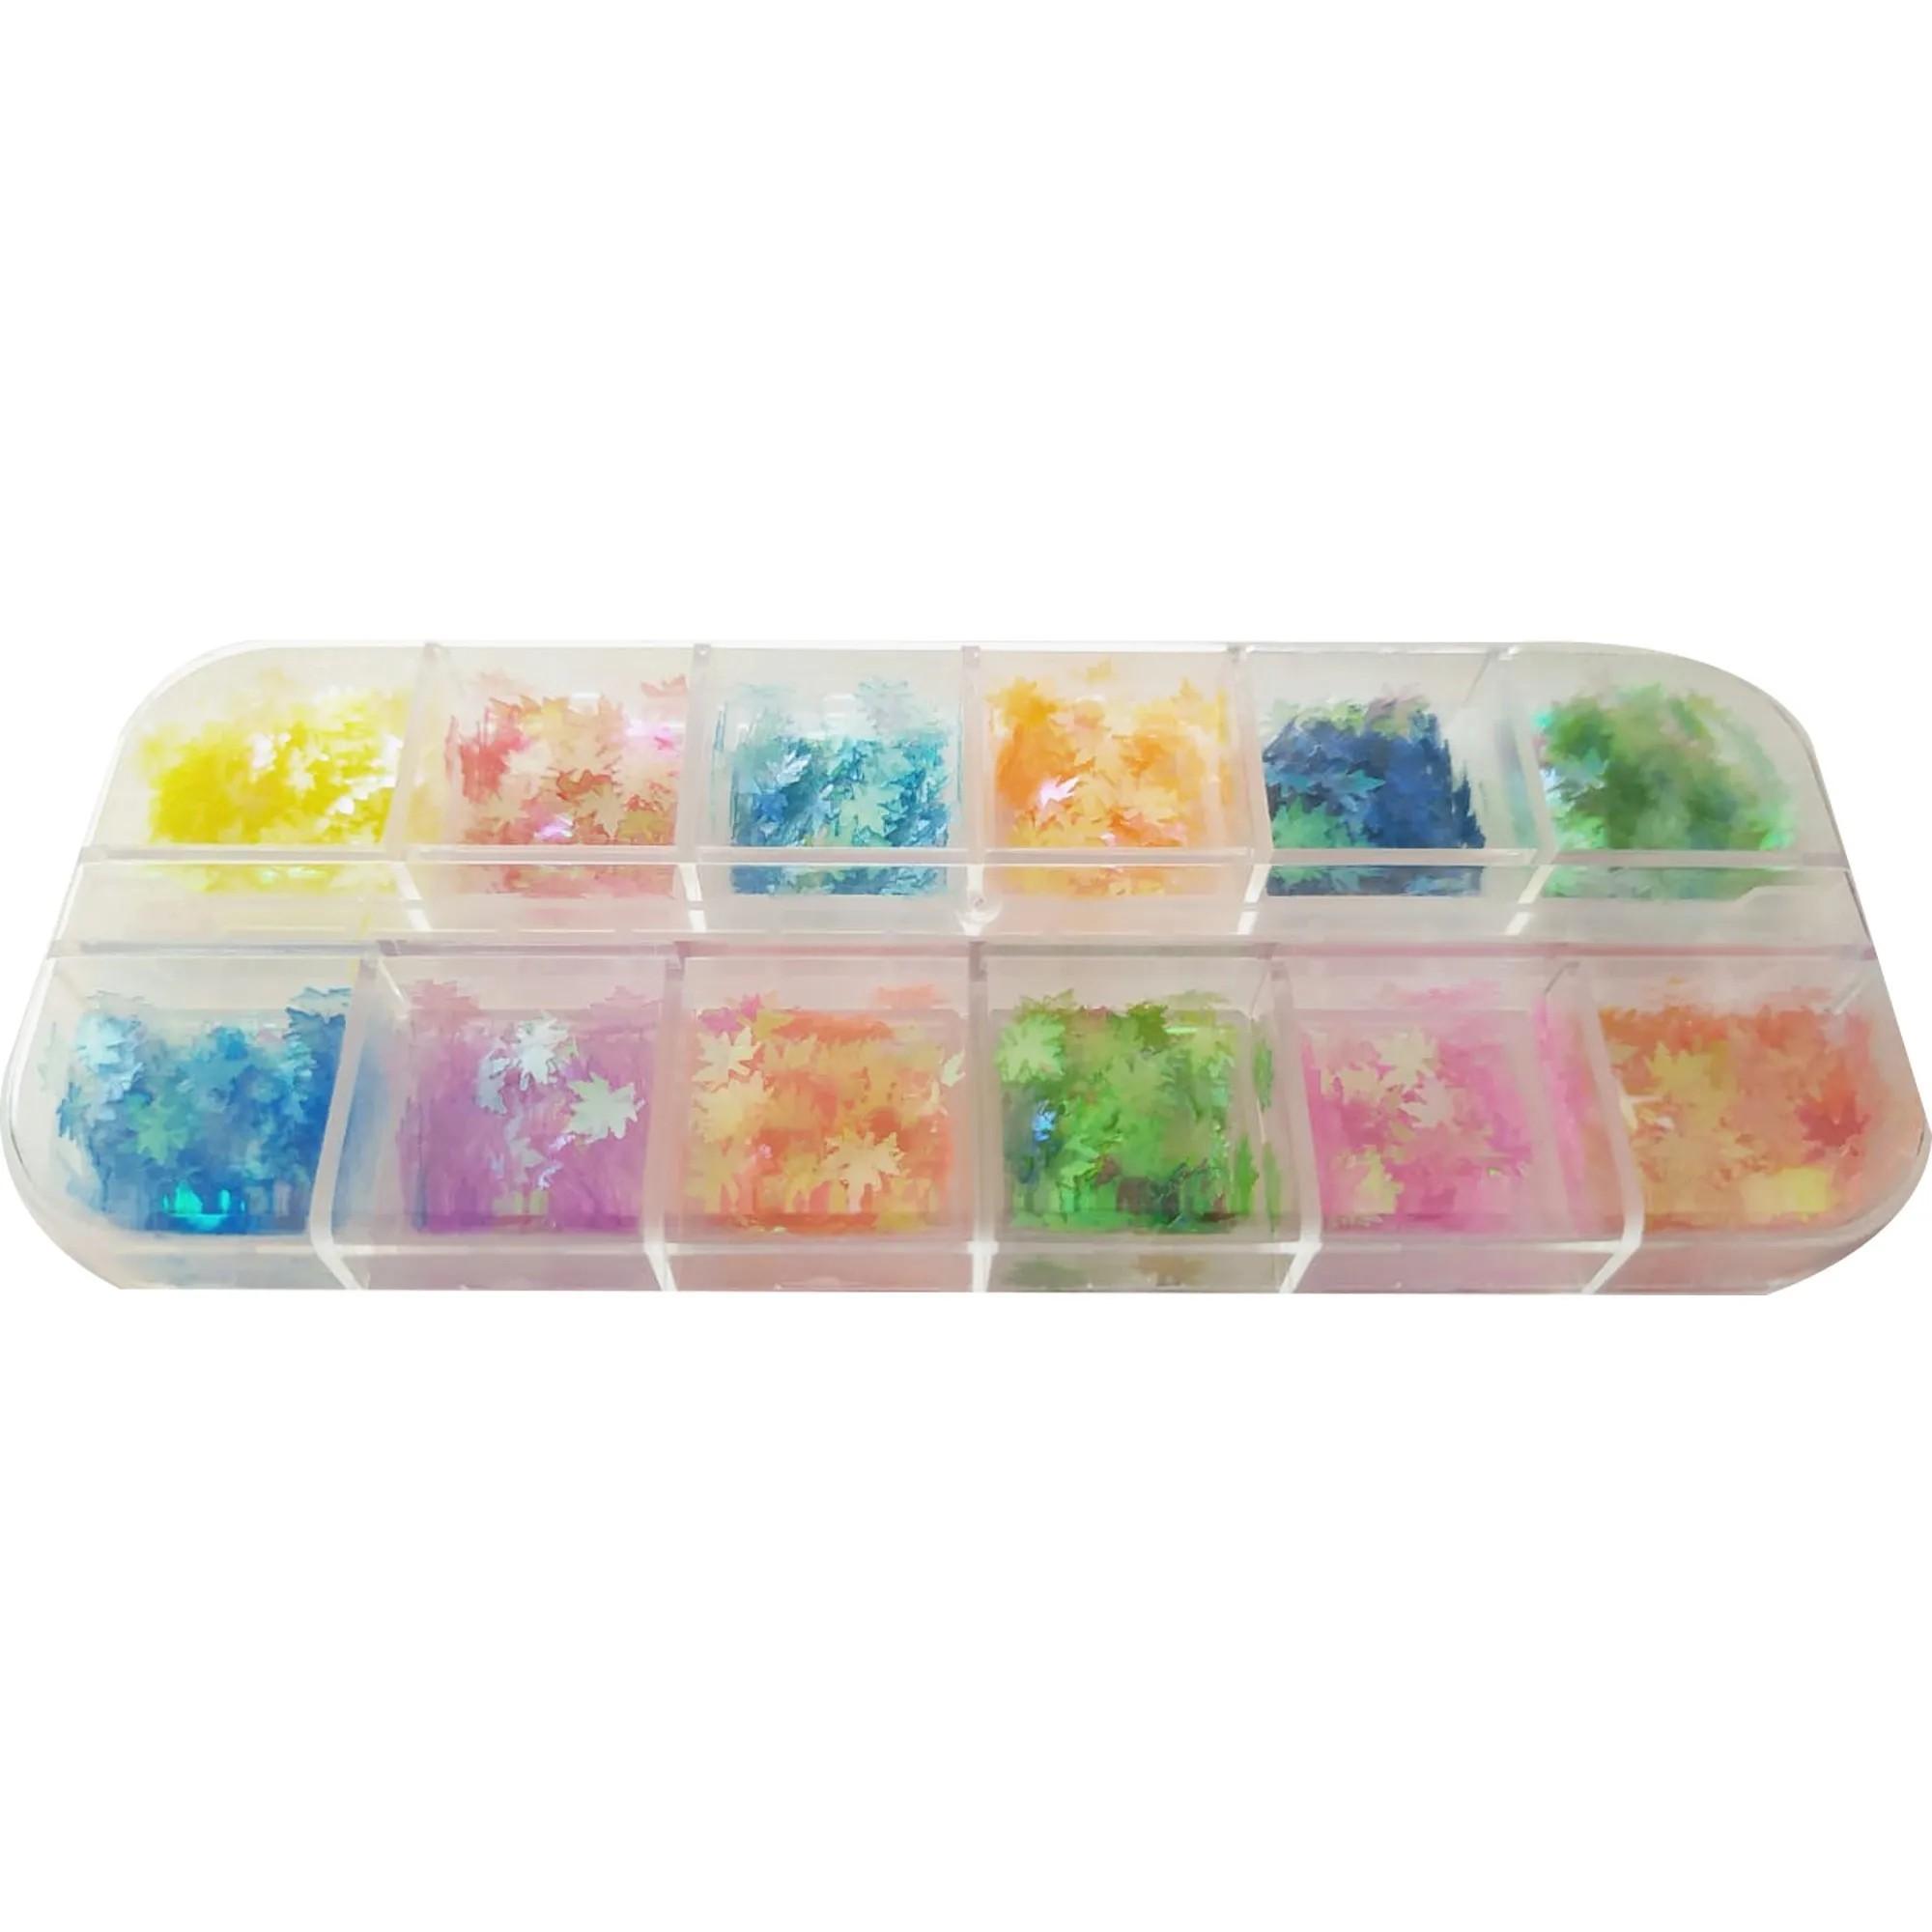 Kit Glitter Formato Folha Néon Para Decoração - 12 Cores